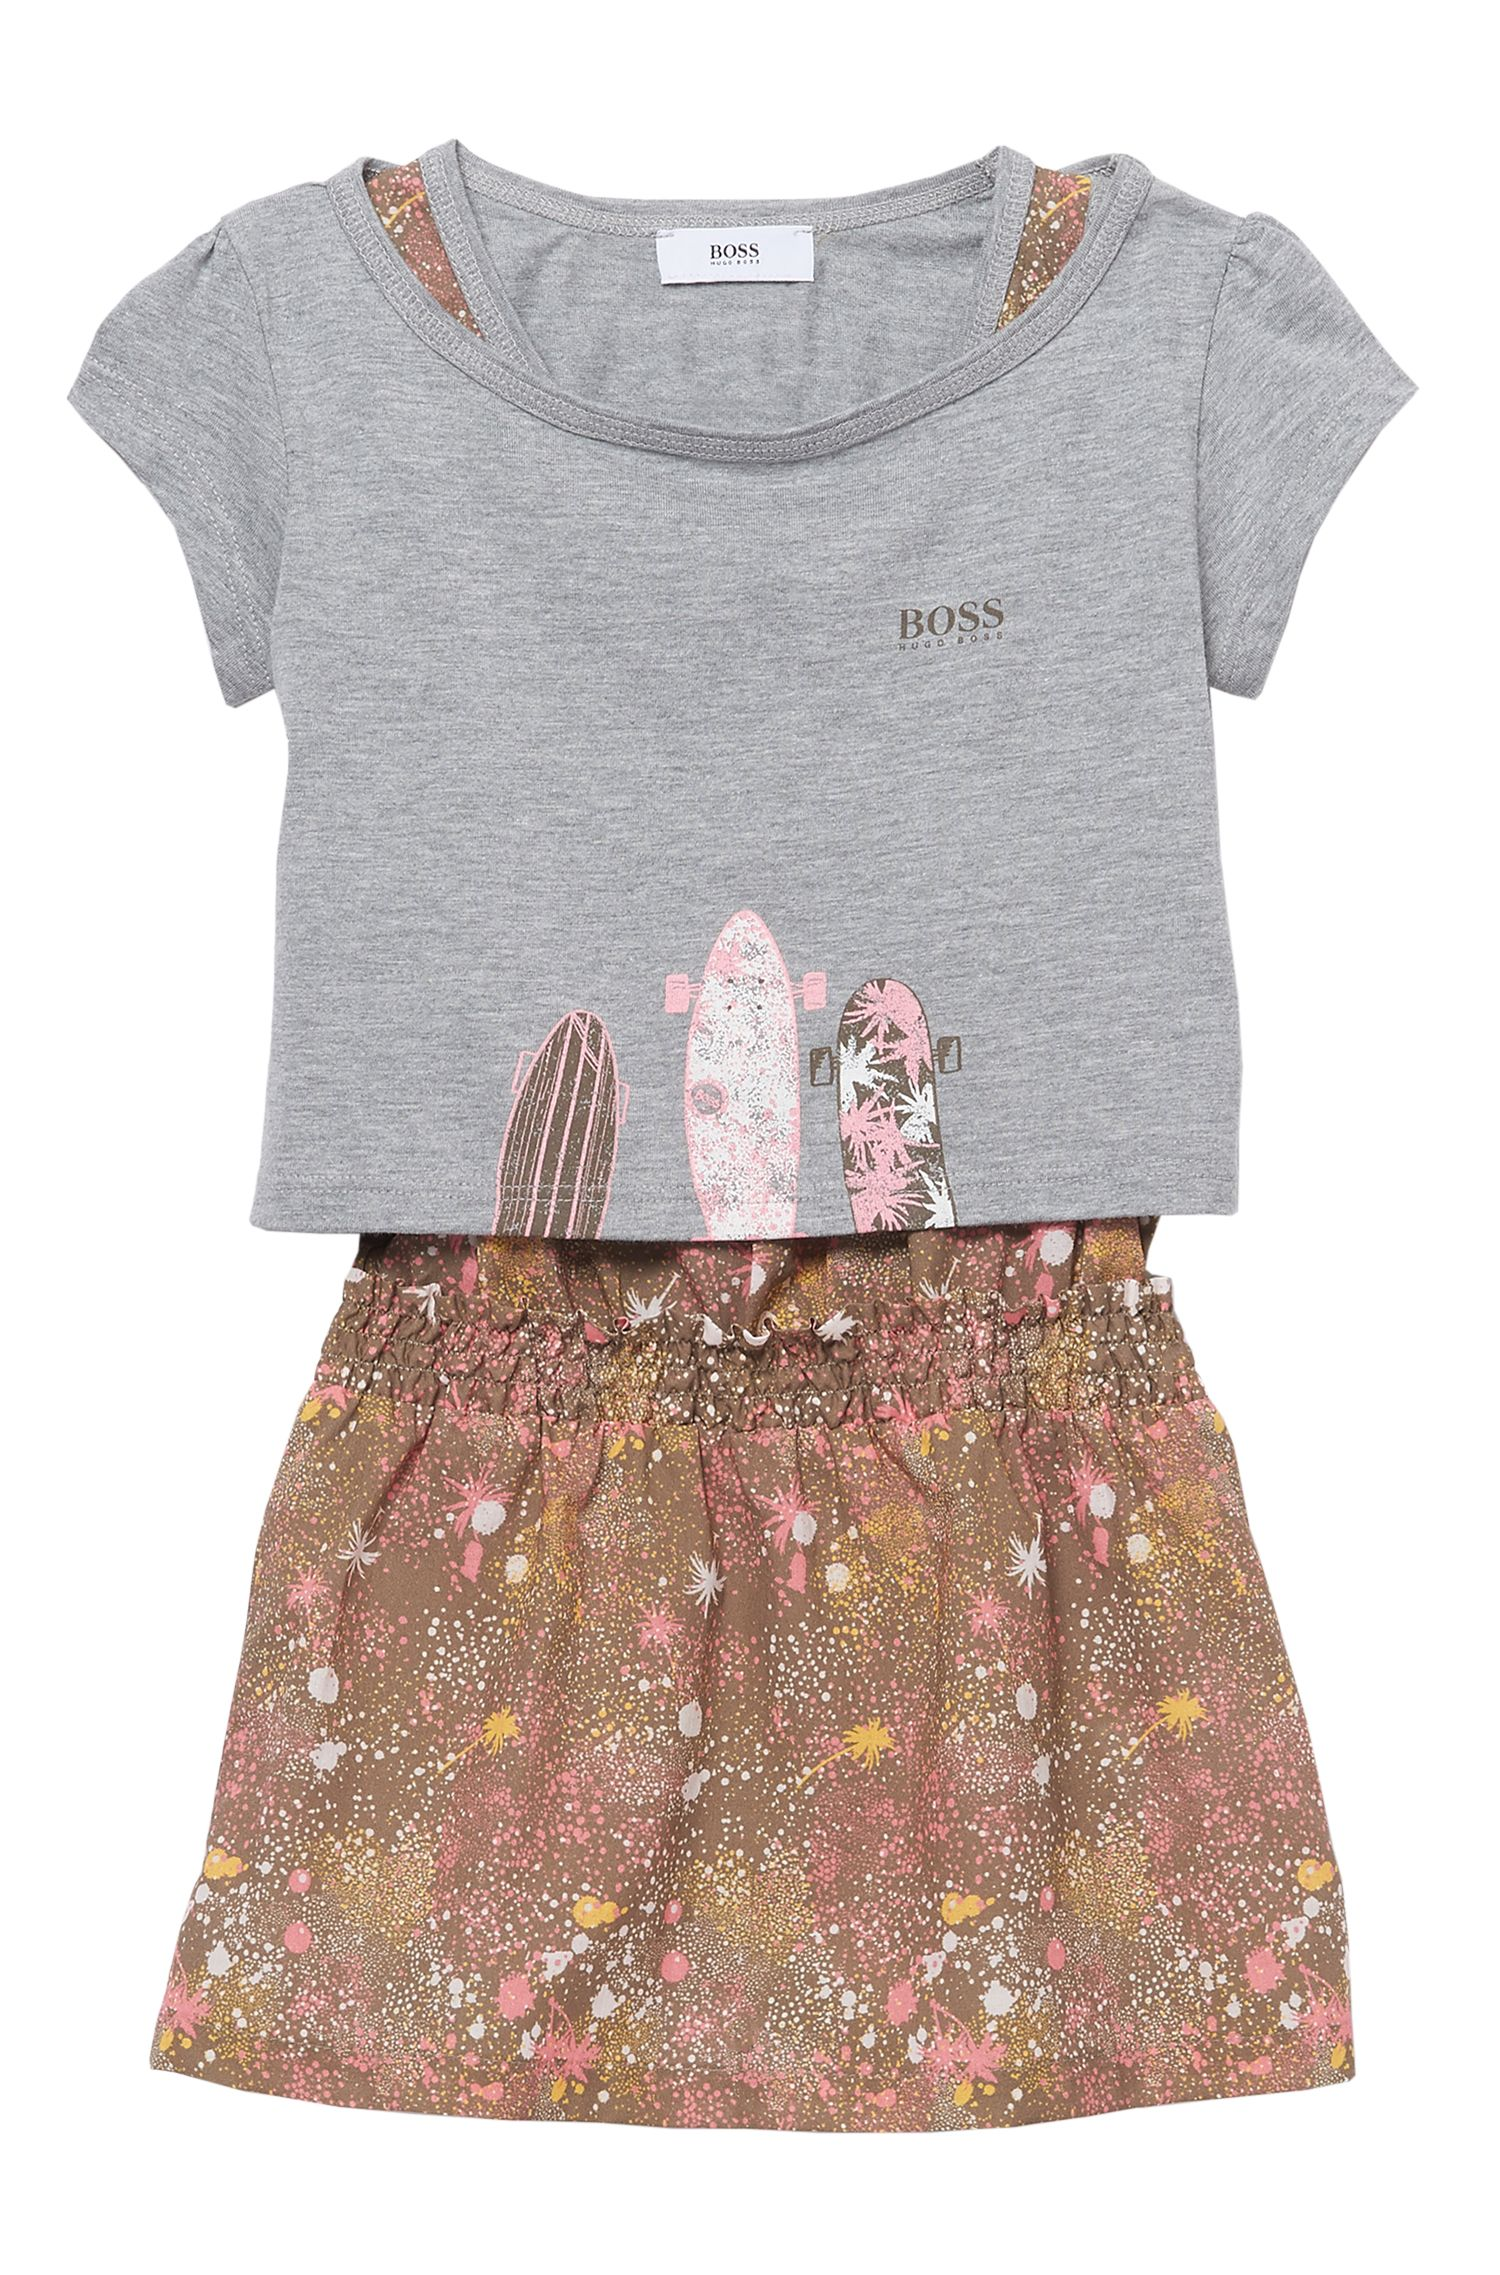 'J18101' | Cotton T-Shirt, Dress Set